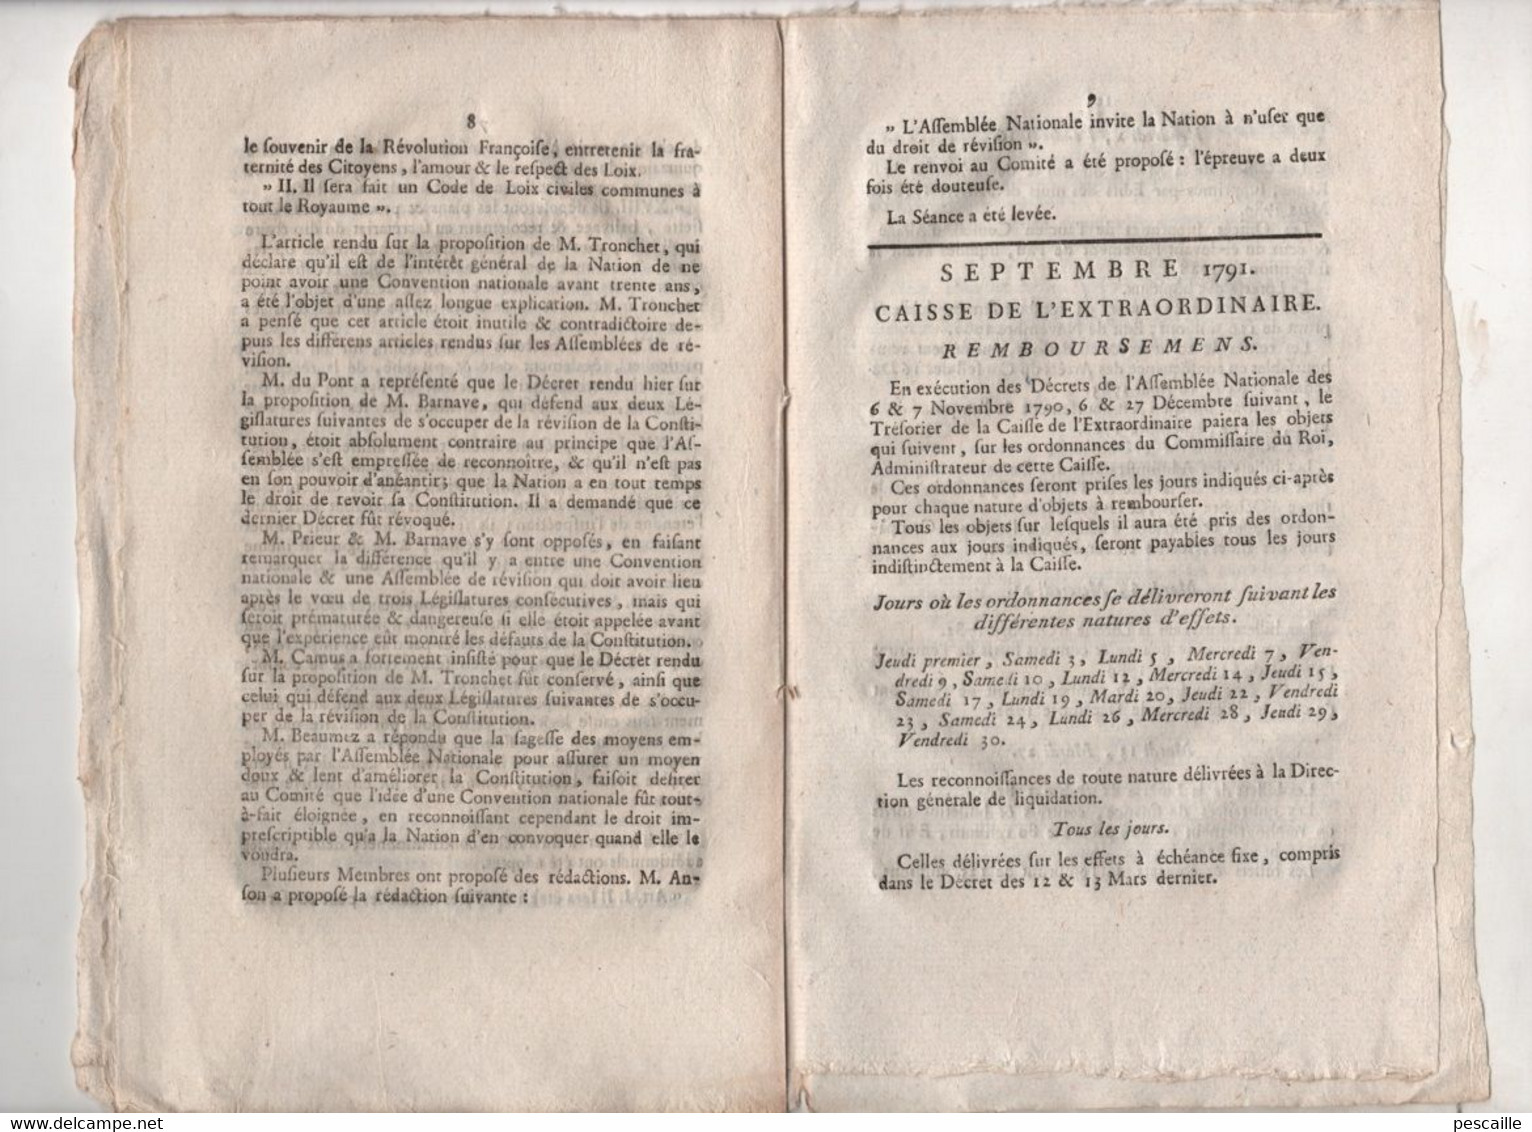 REVOLUTION FRANCAISE ASSEMBLEE NATIONALE - JOURNAL DES DEBATS 02 09 1791 - GARDES FORESTIERS / INSPECTEURS ... - Newspapers - Before 1800